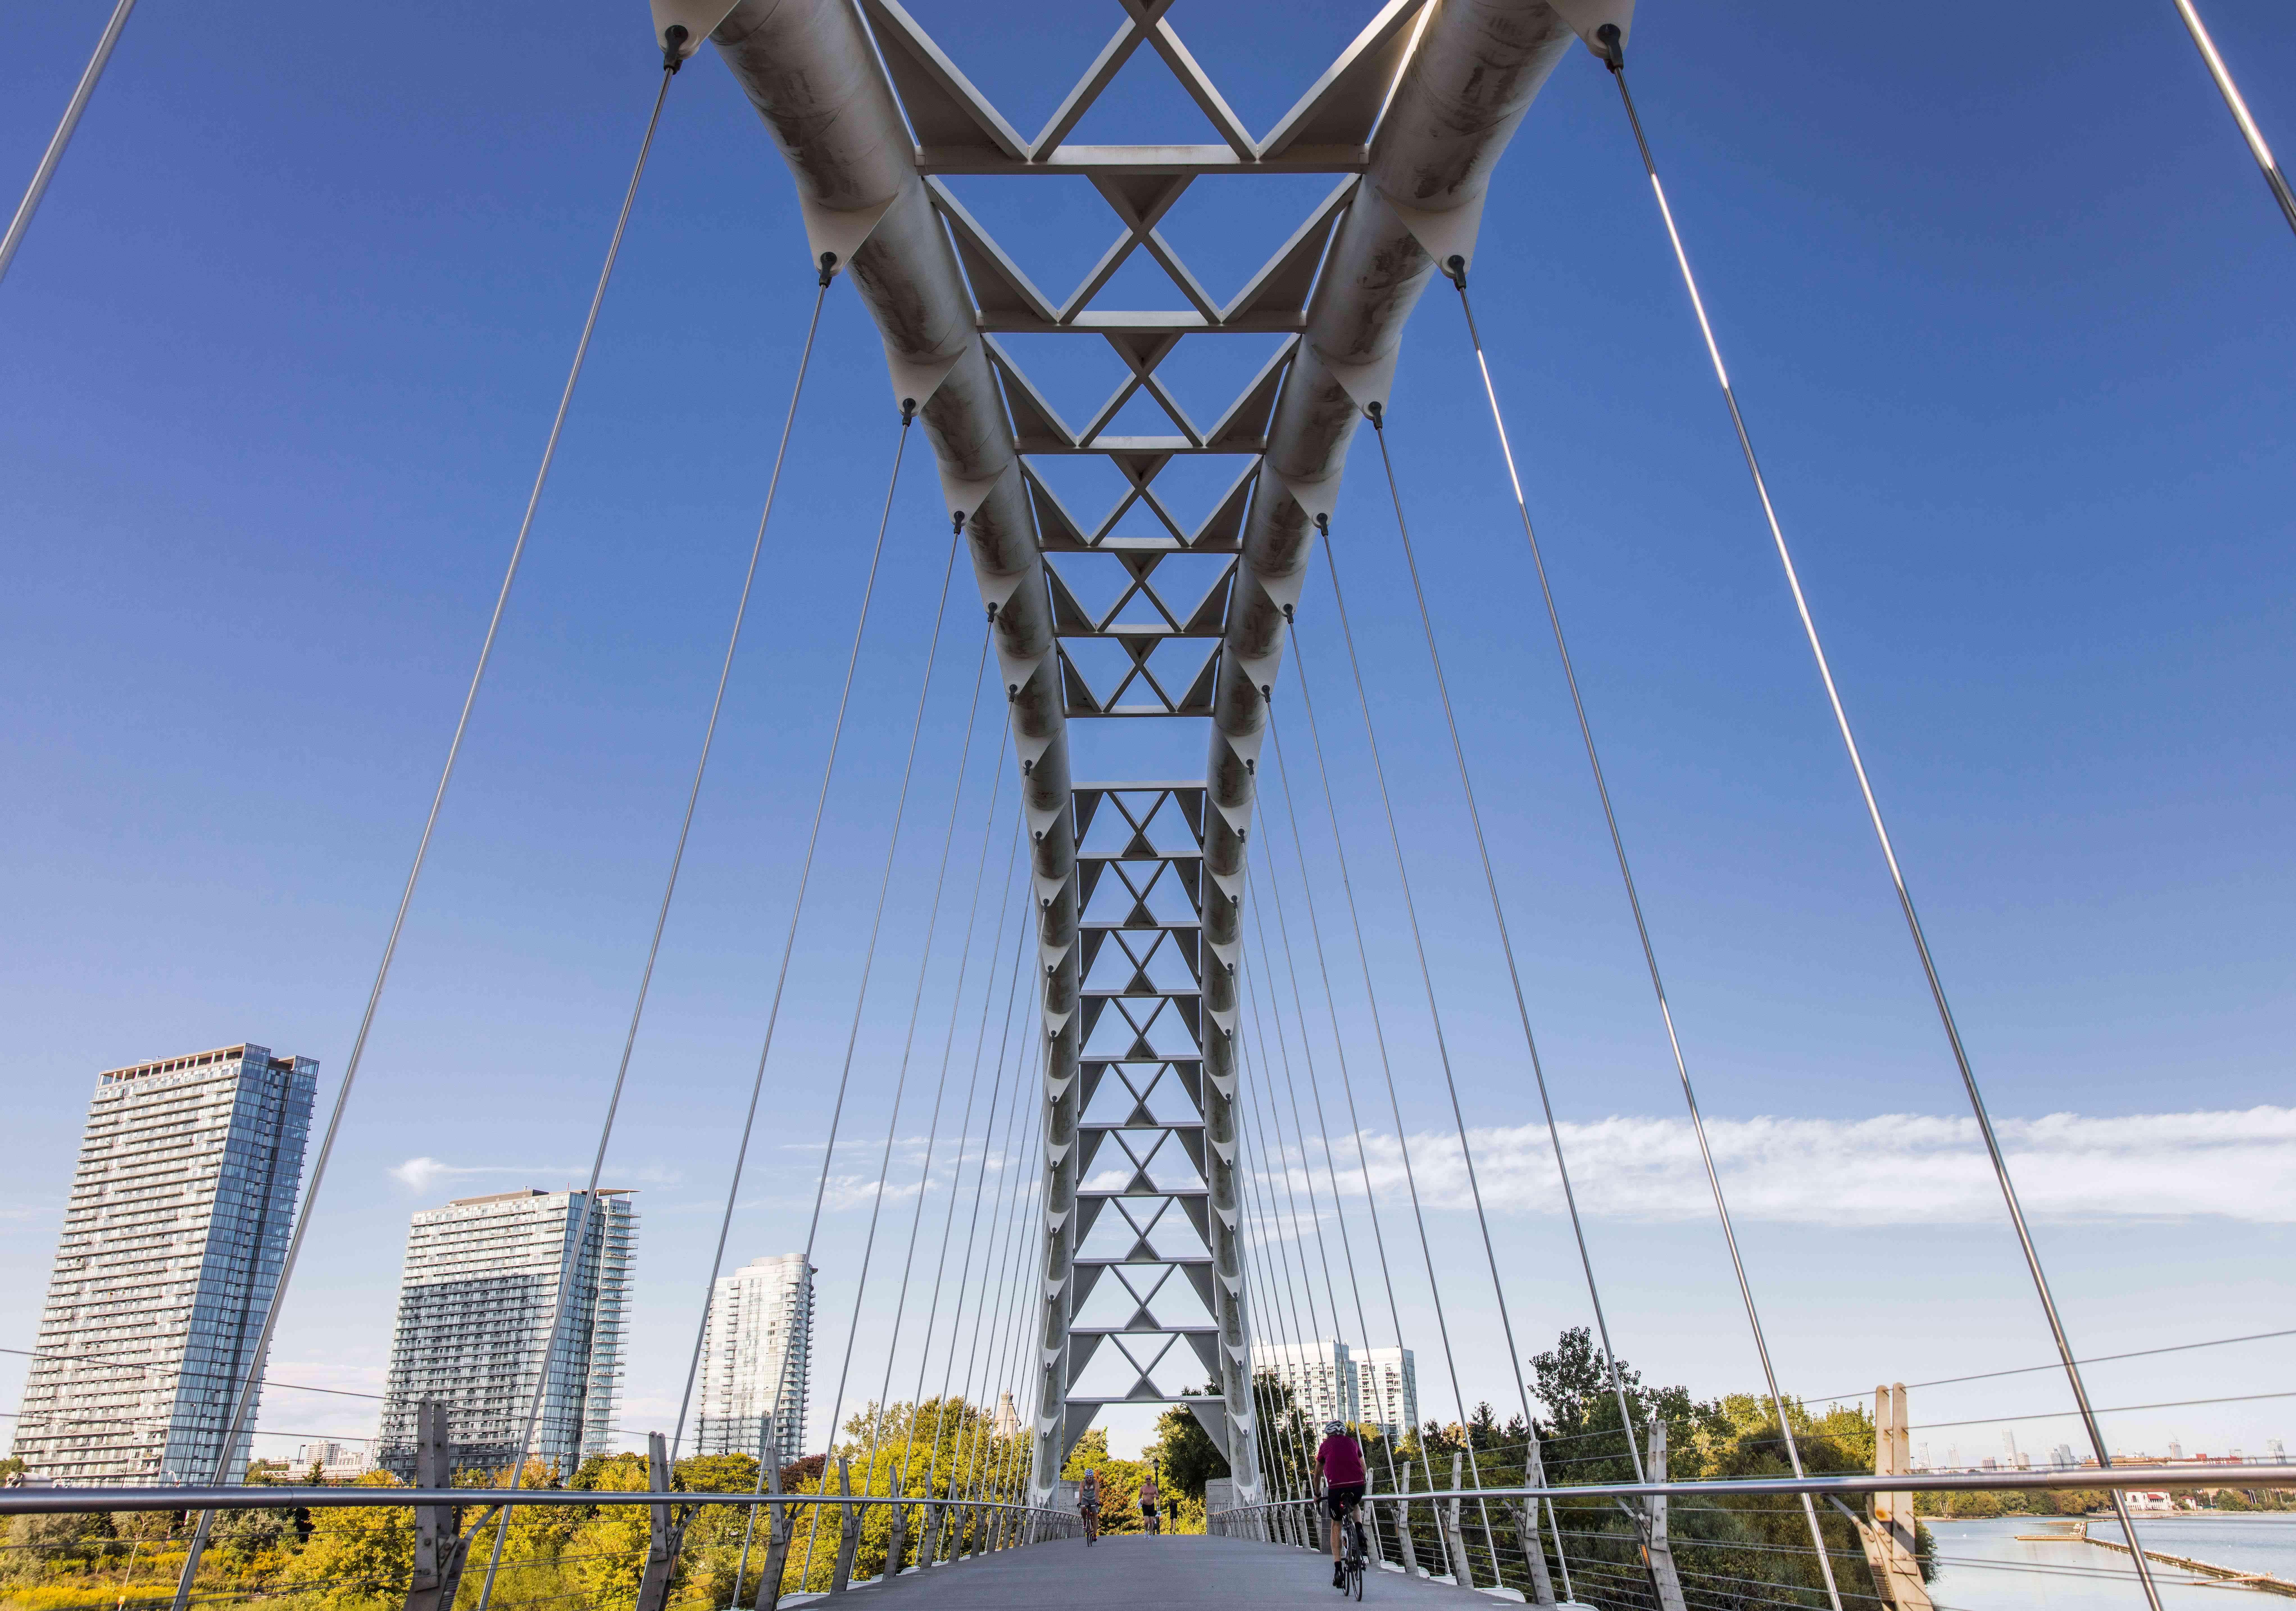 Humber Bay Bridge in Toronto